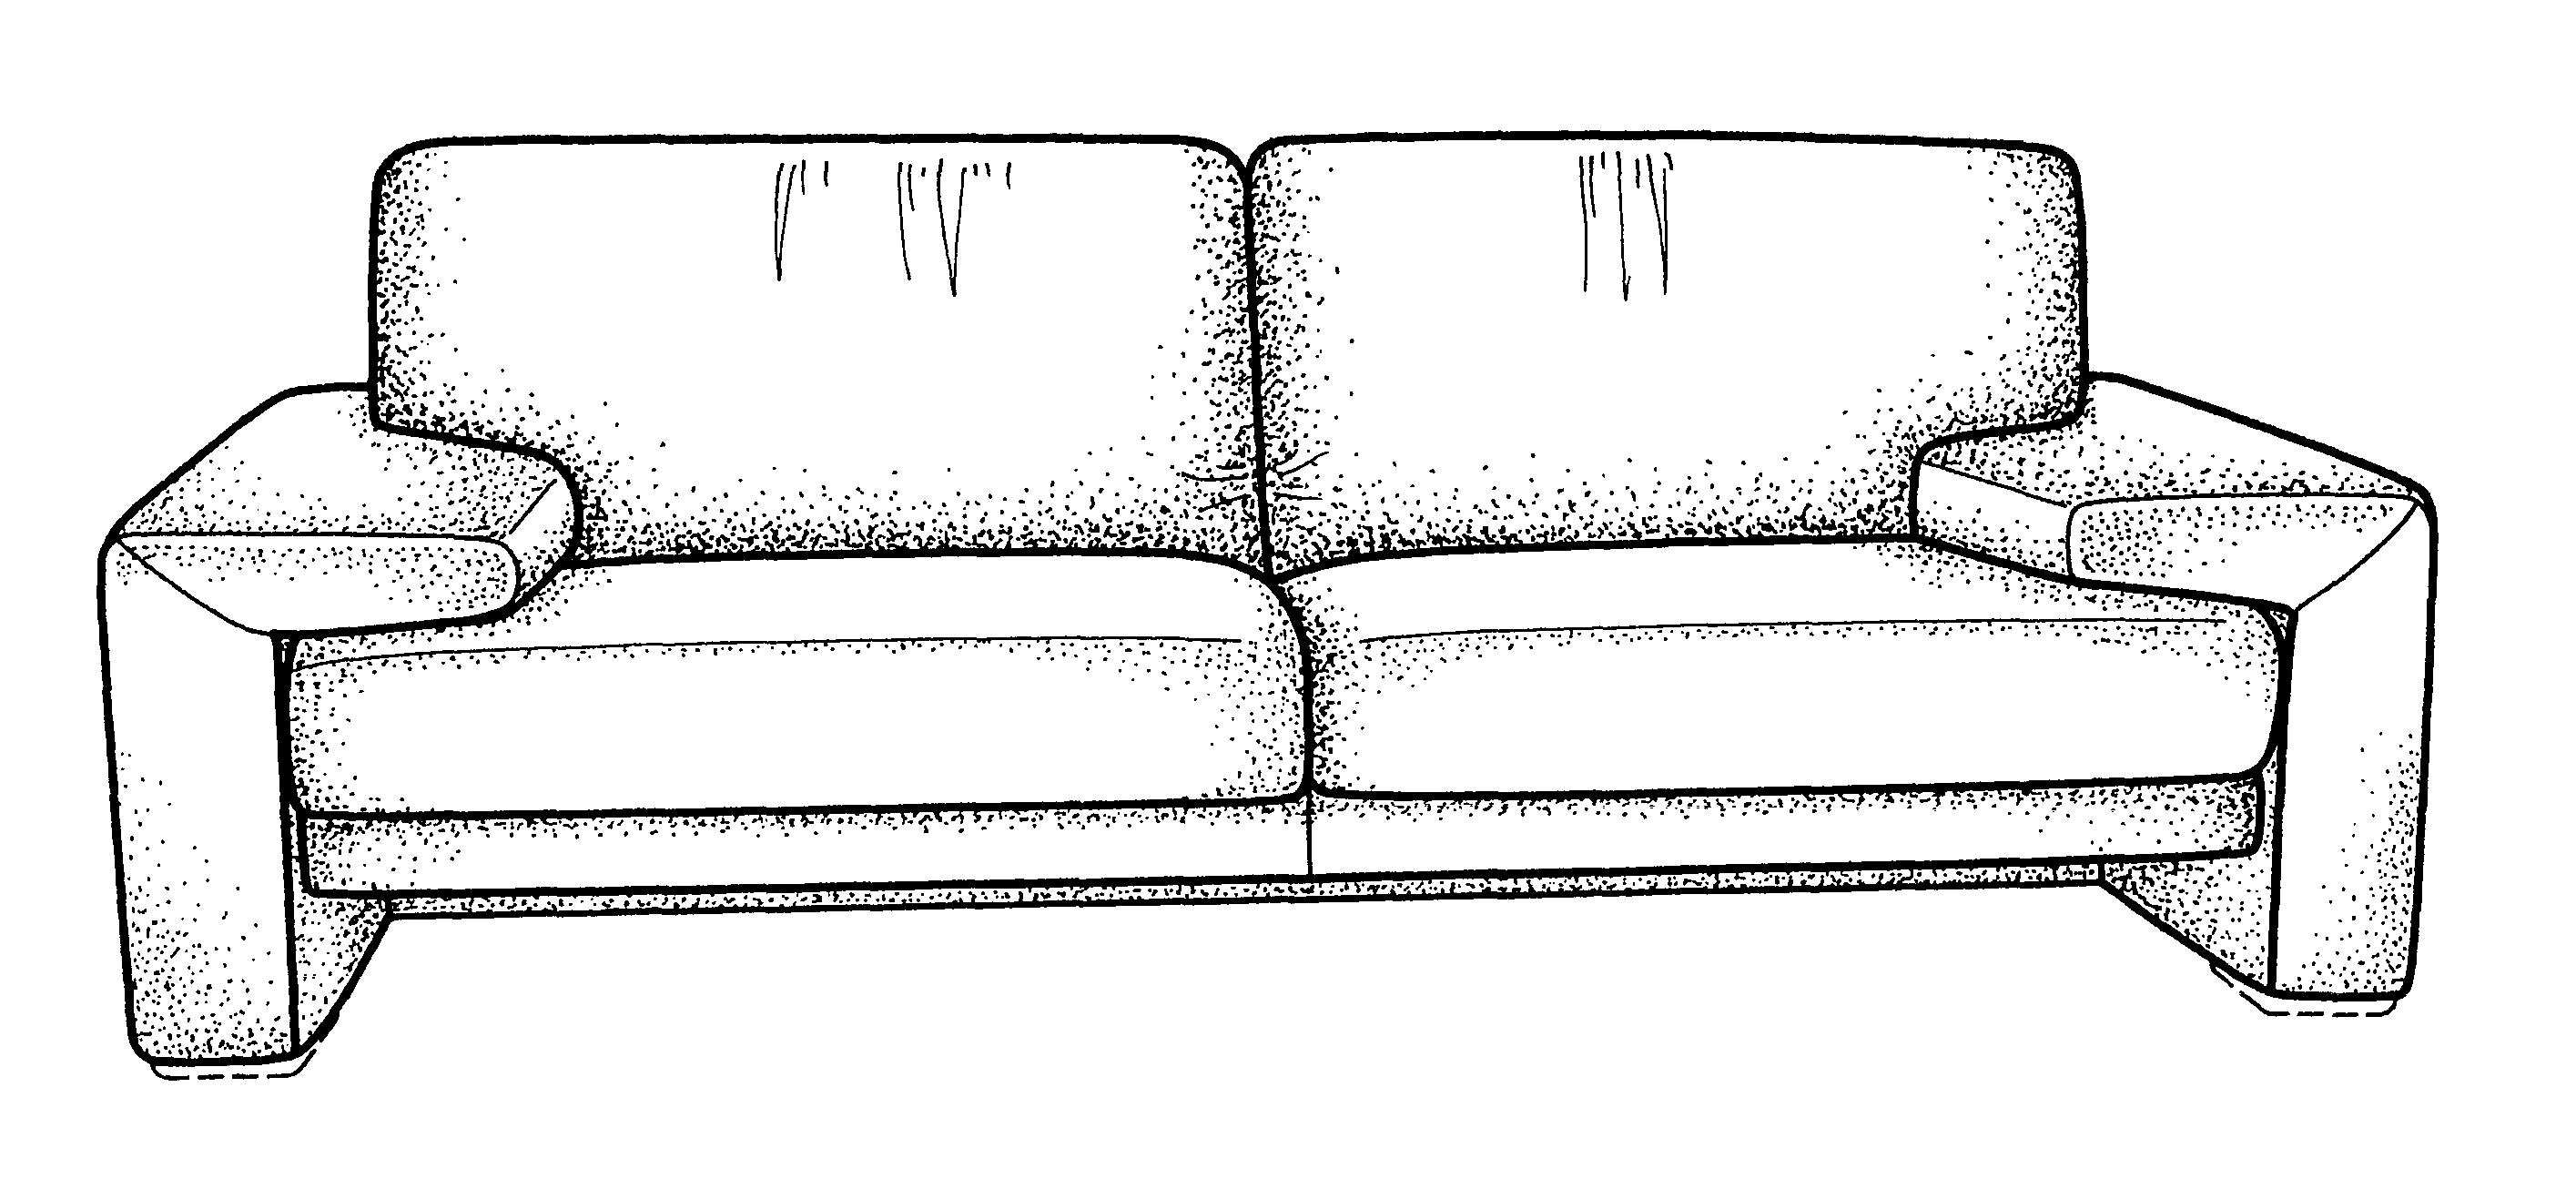 Front Elevation Of Sofa : Patente usd sofa patentes do google